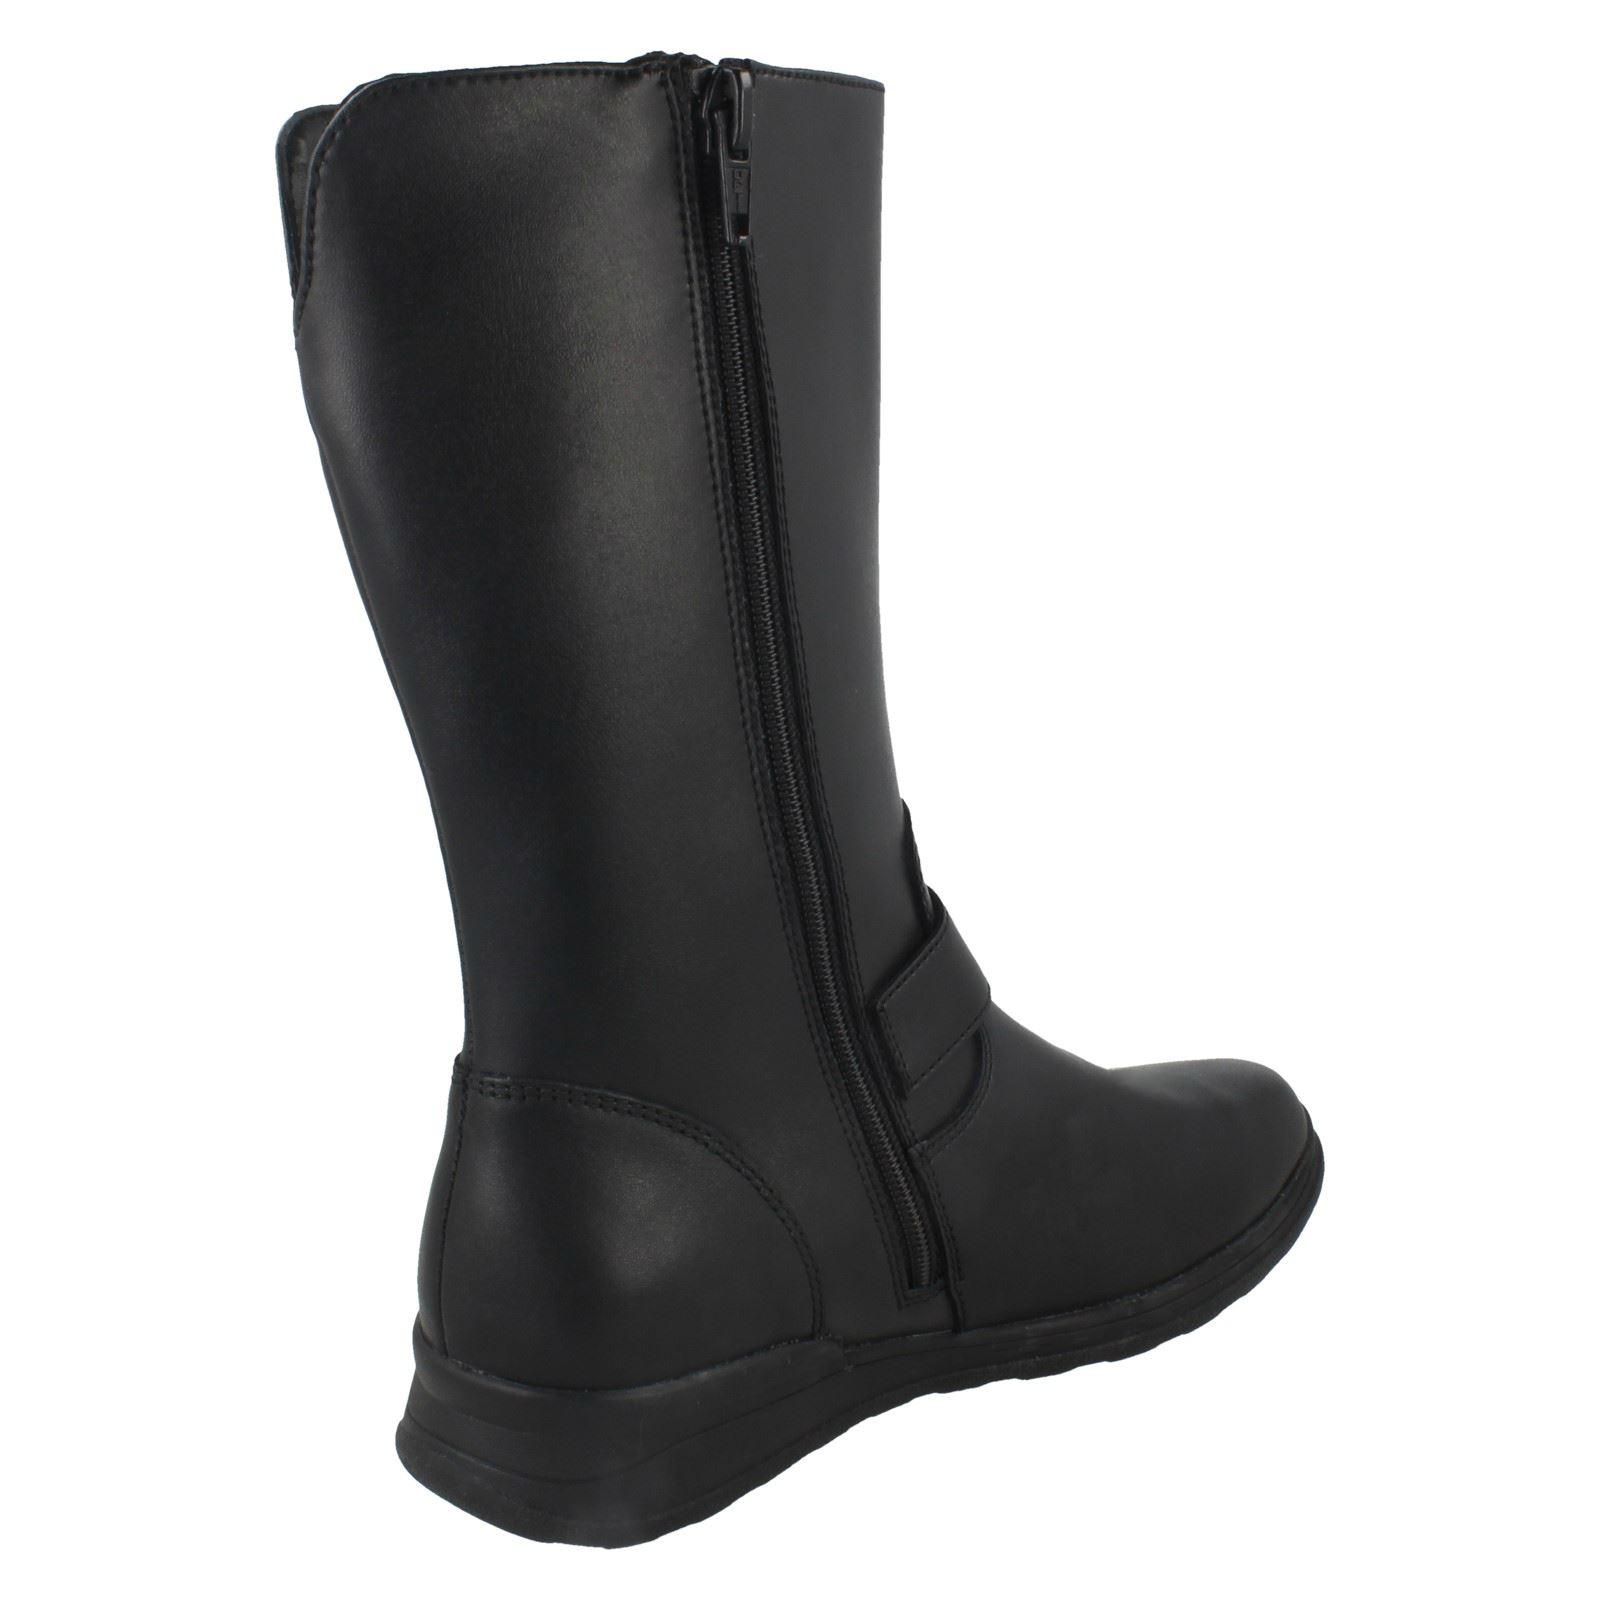 Girls Clarks Mid Calf Boots *Mariel Star*